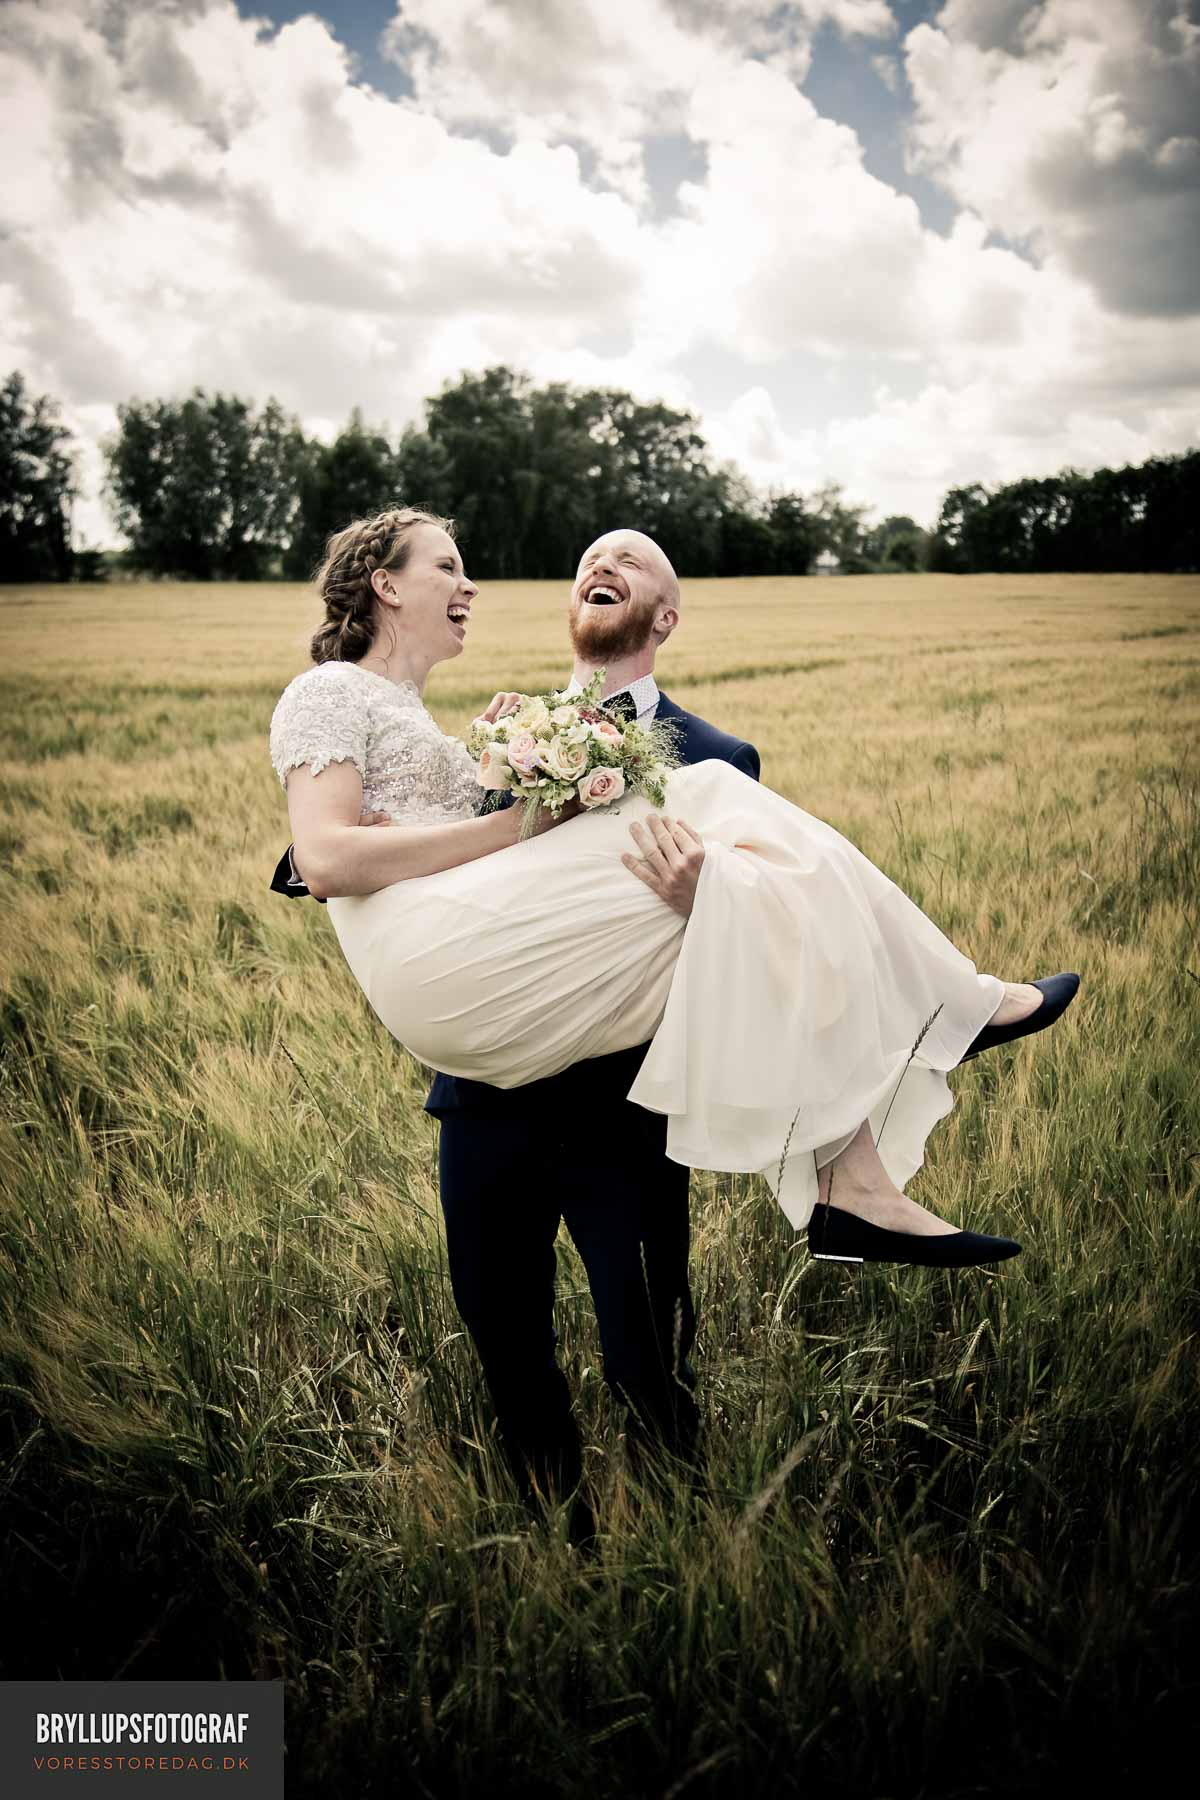 bryllupsfotografering ved Svanninge Bakker